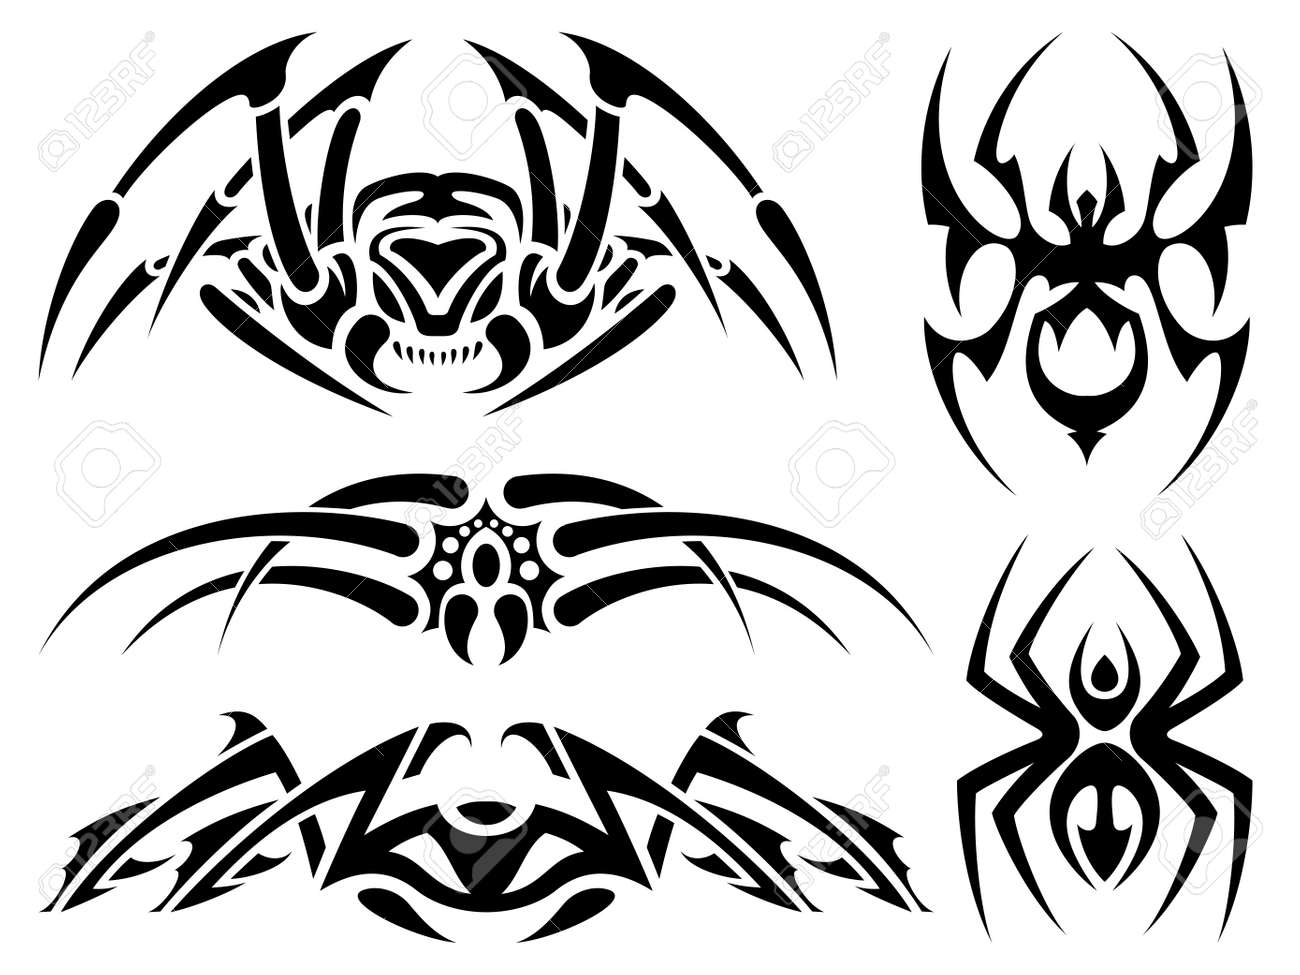 spider tattoos Stock Vector - 13543666